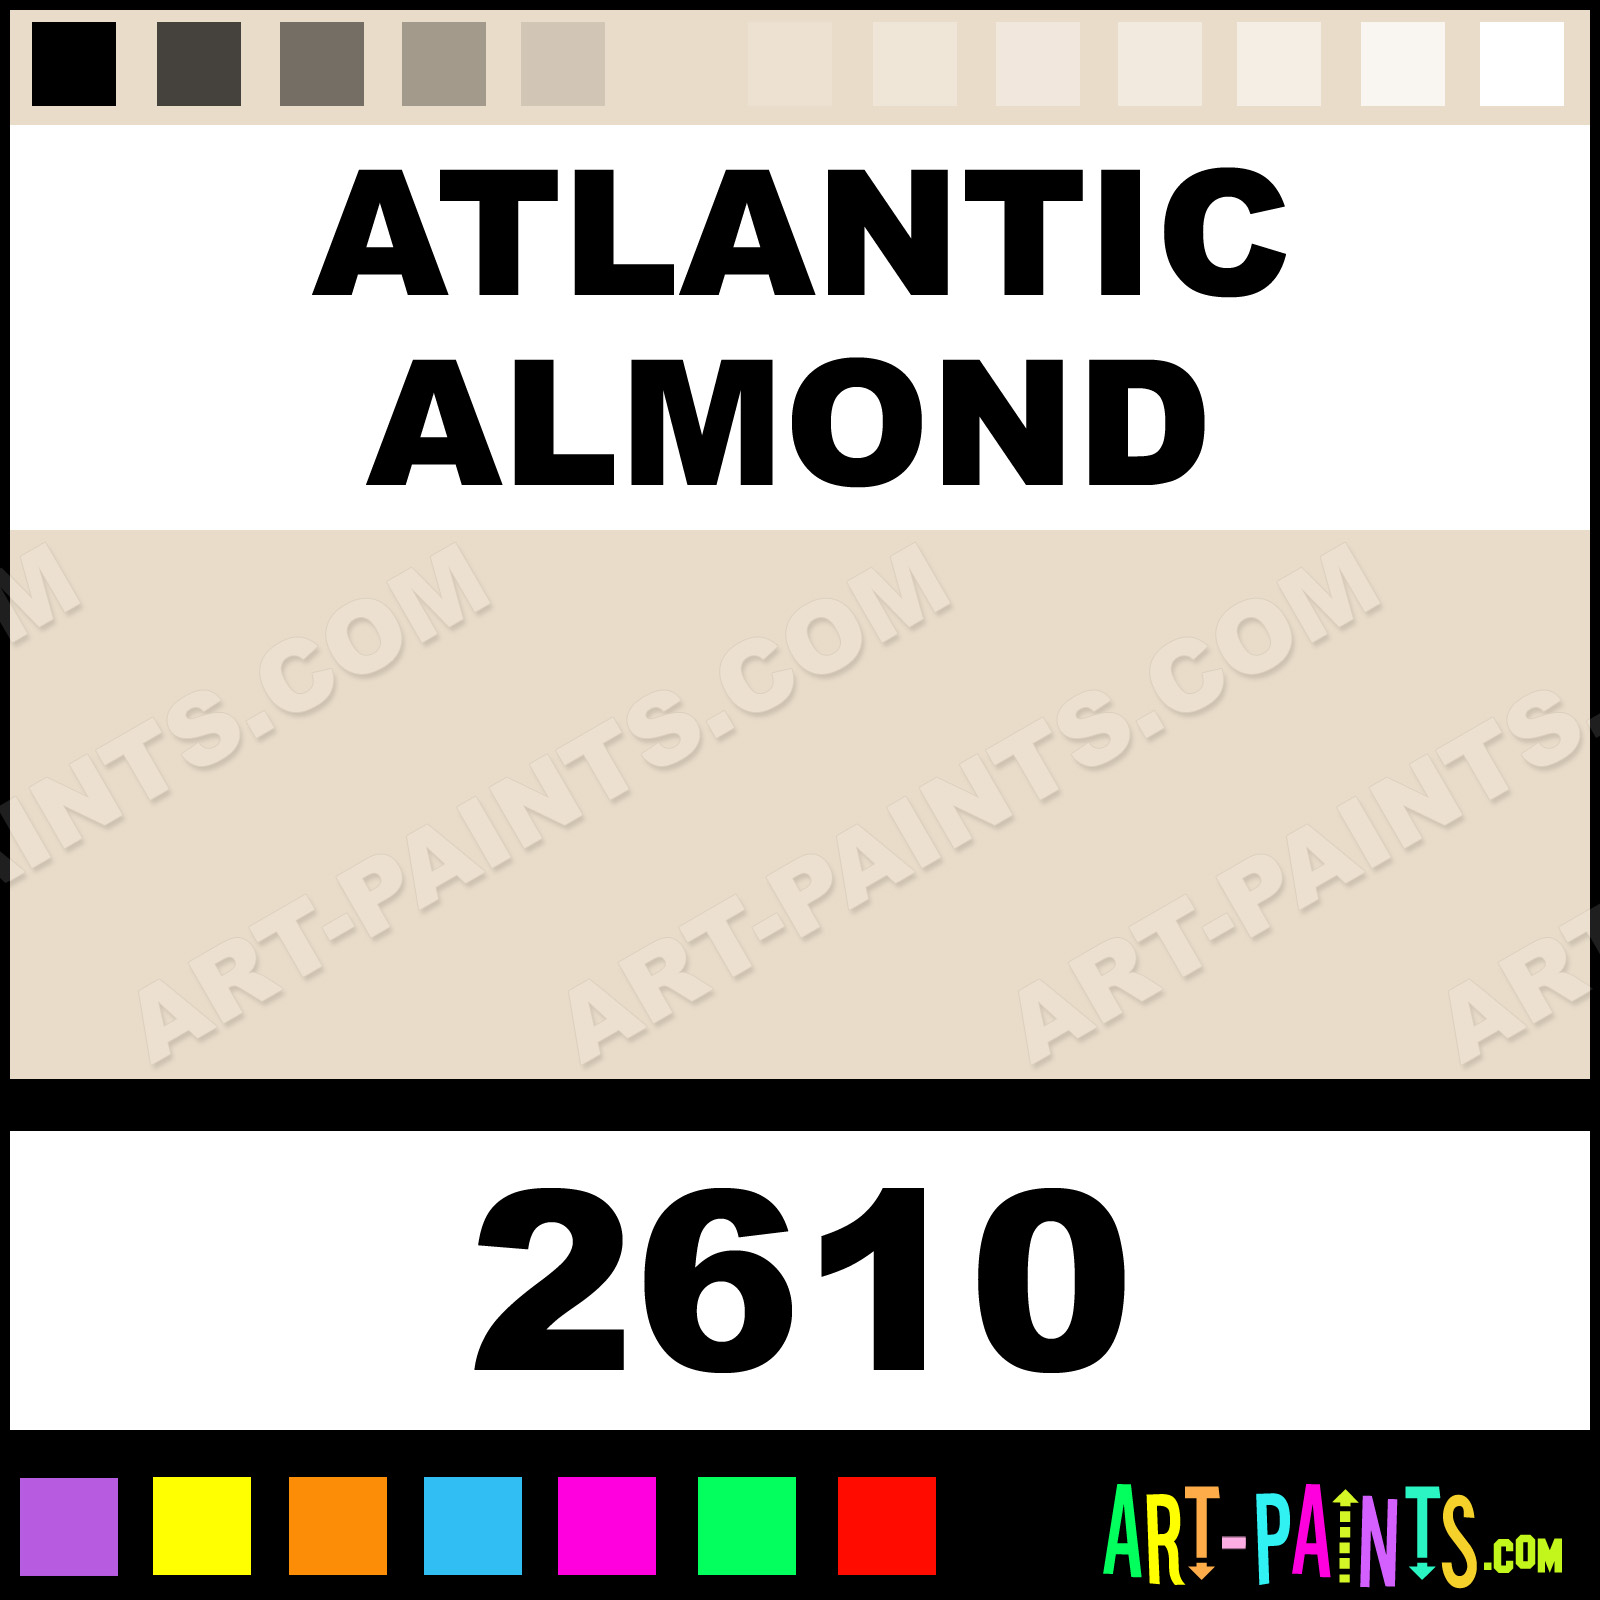 atlantic almond h2o latex spray paints 2610 atlantic. Black Bedroom Furniture Sets. Home Design Ideas